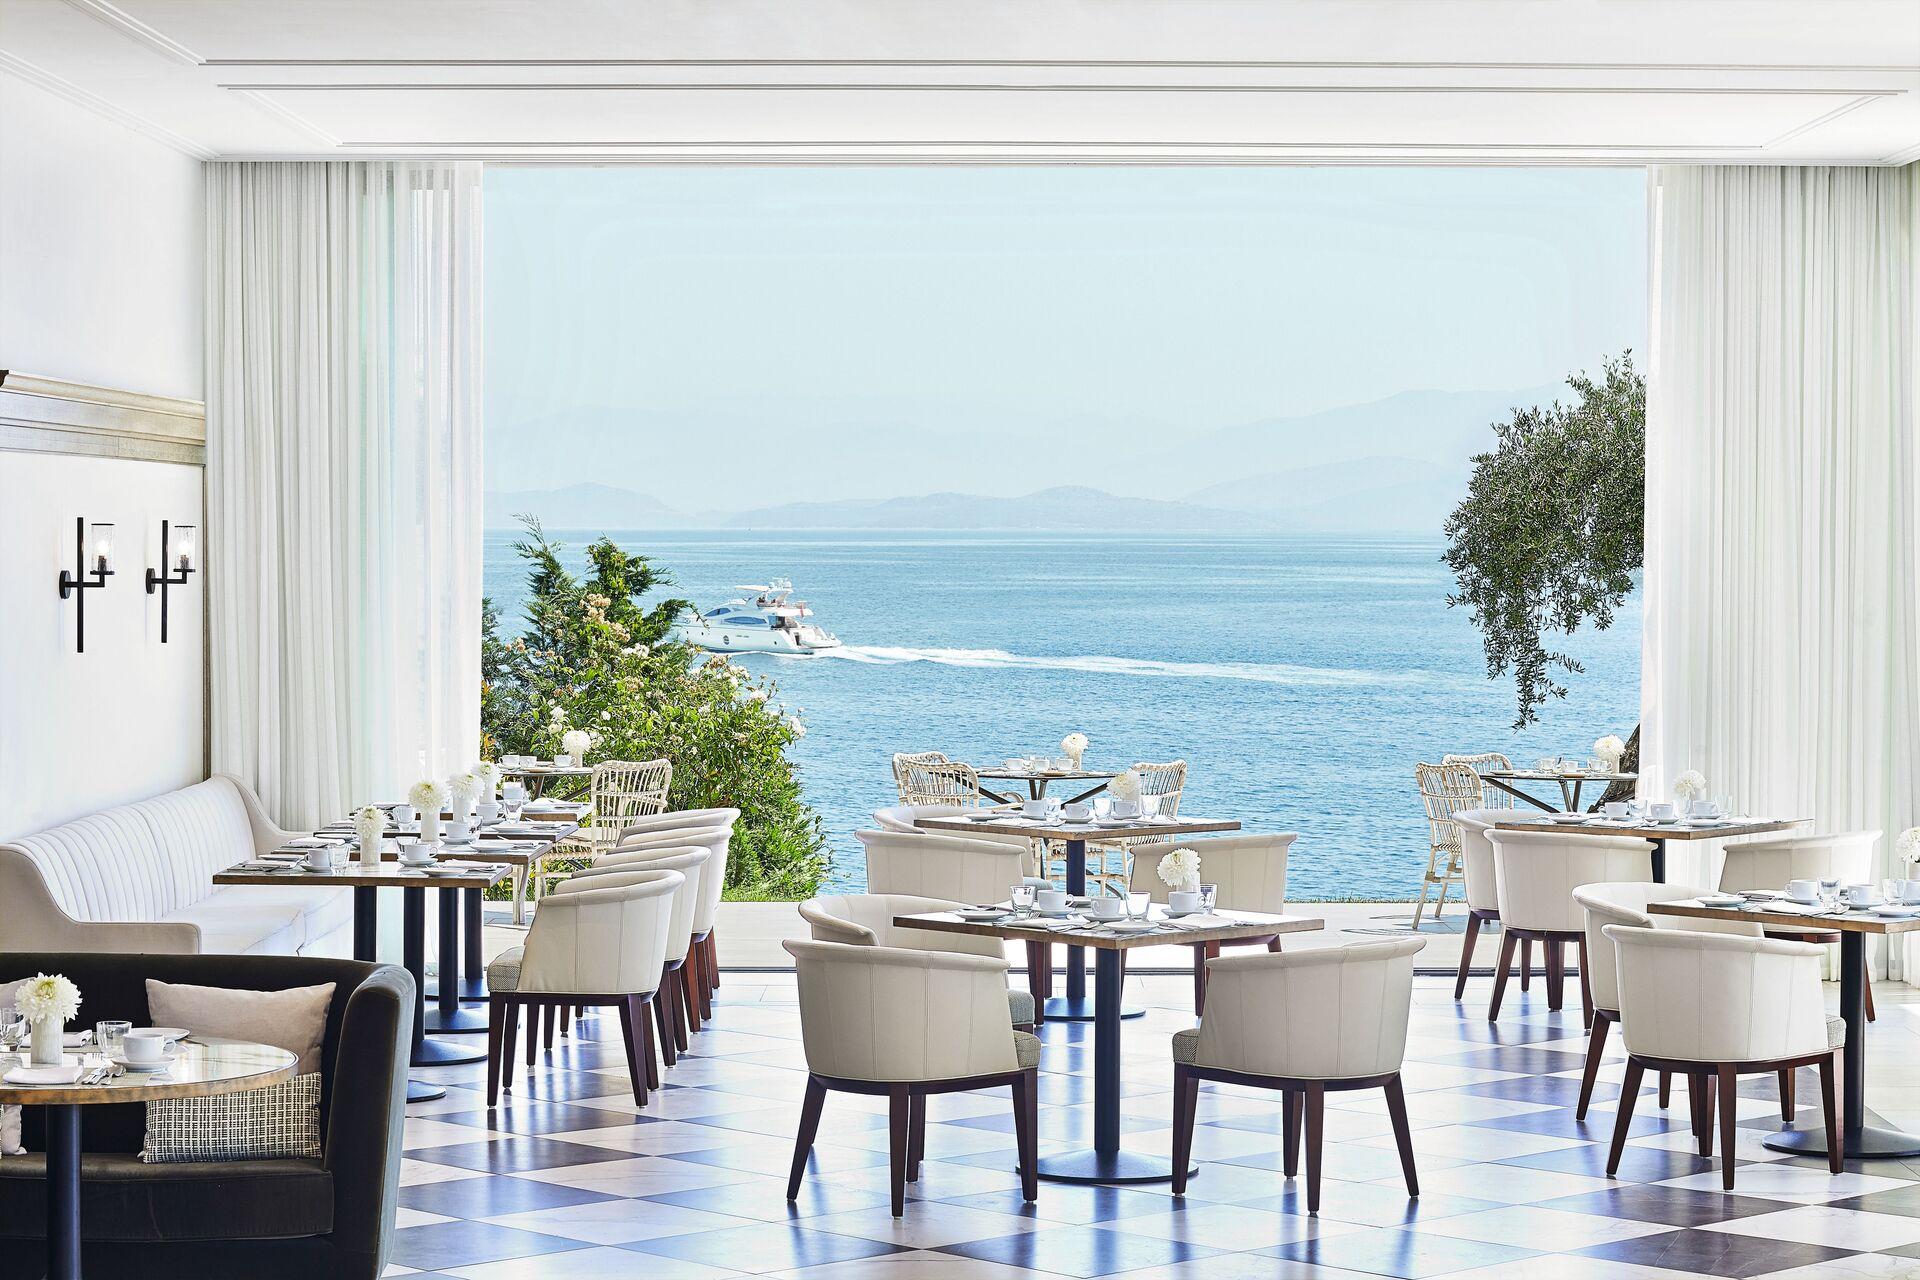 https://cms.satur.sk/data/imgs/tour_image/orig/10-mon-repos-mediterranean-restaurant_72dpi-1-1943075.jpg